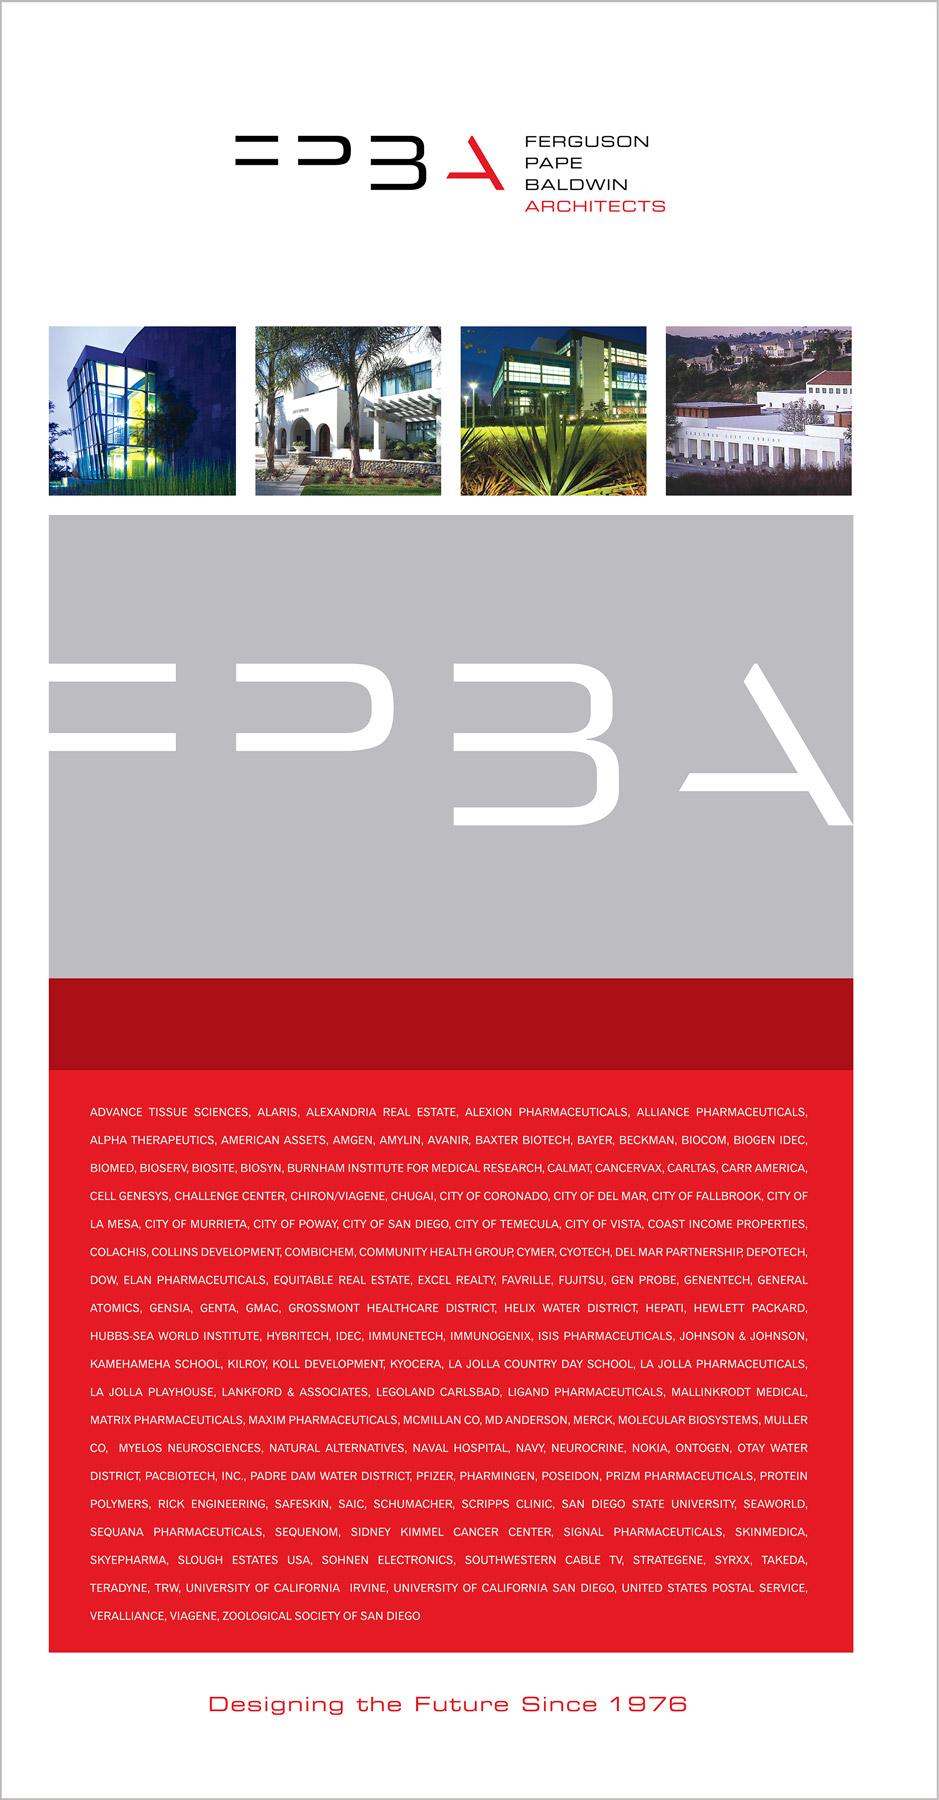 Ferguson Pape Baldwin Architects Exhibit 1